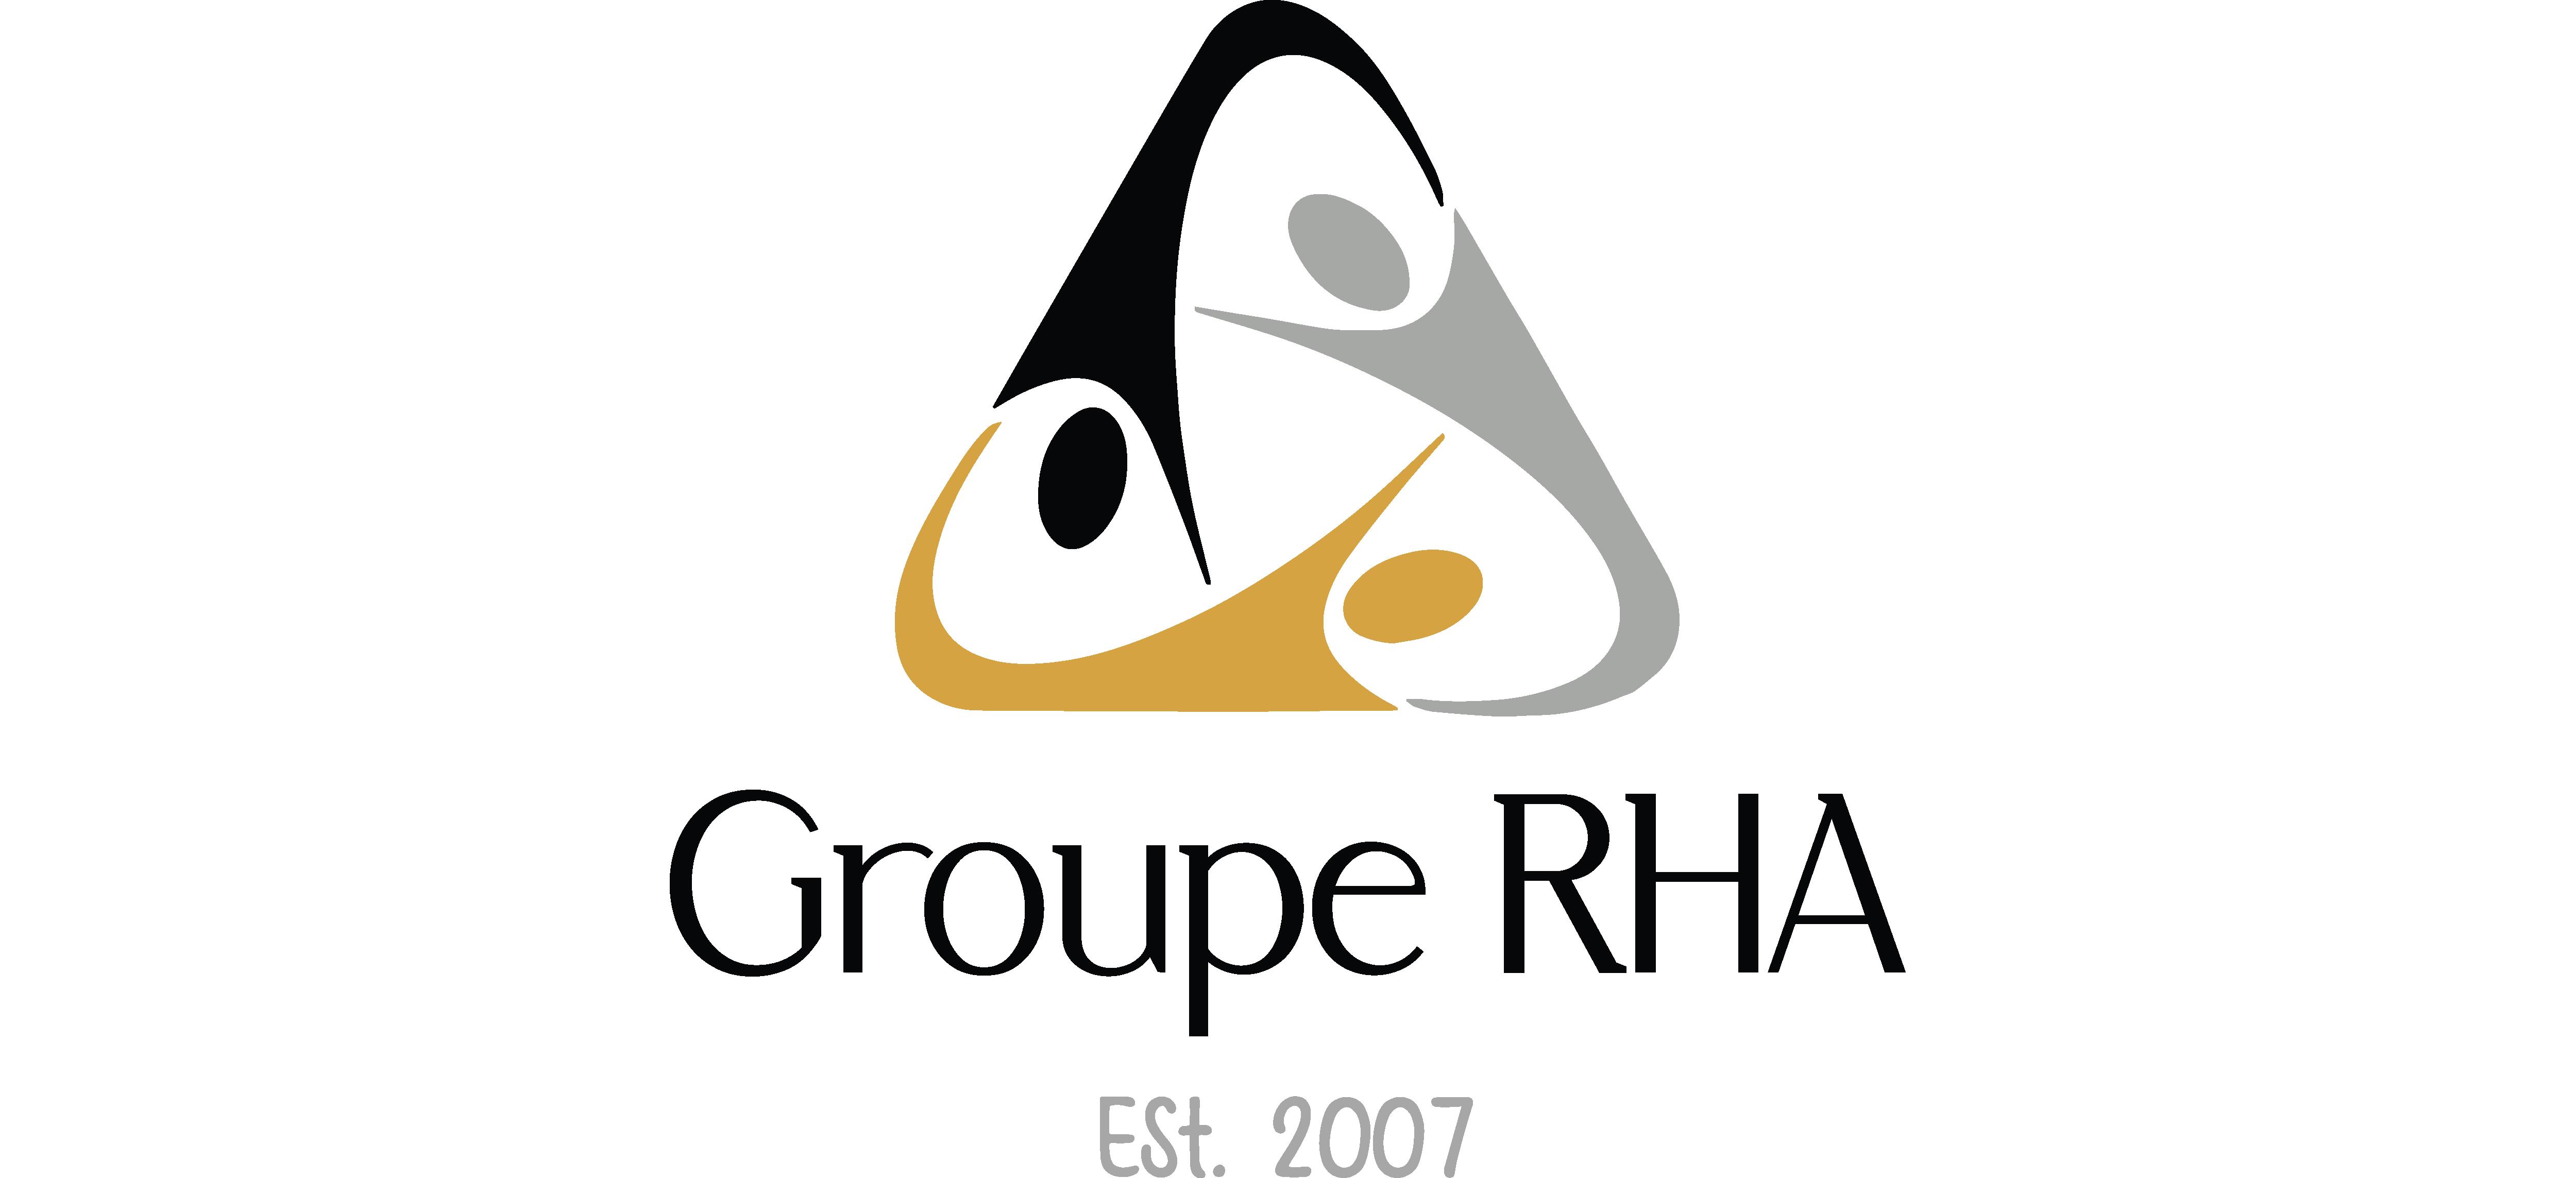 Groupe RHA